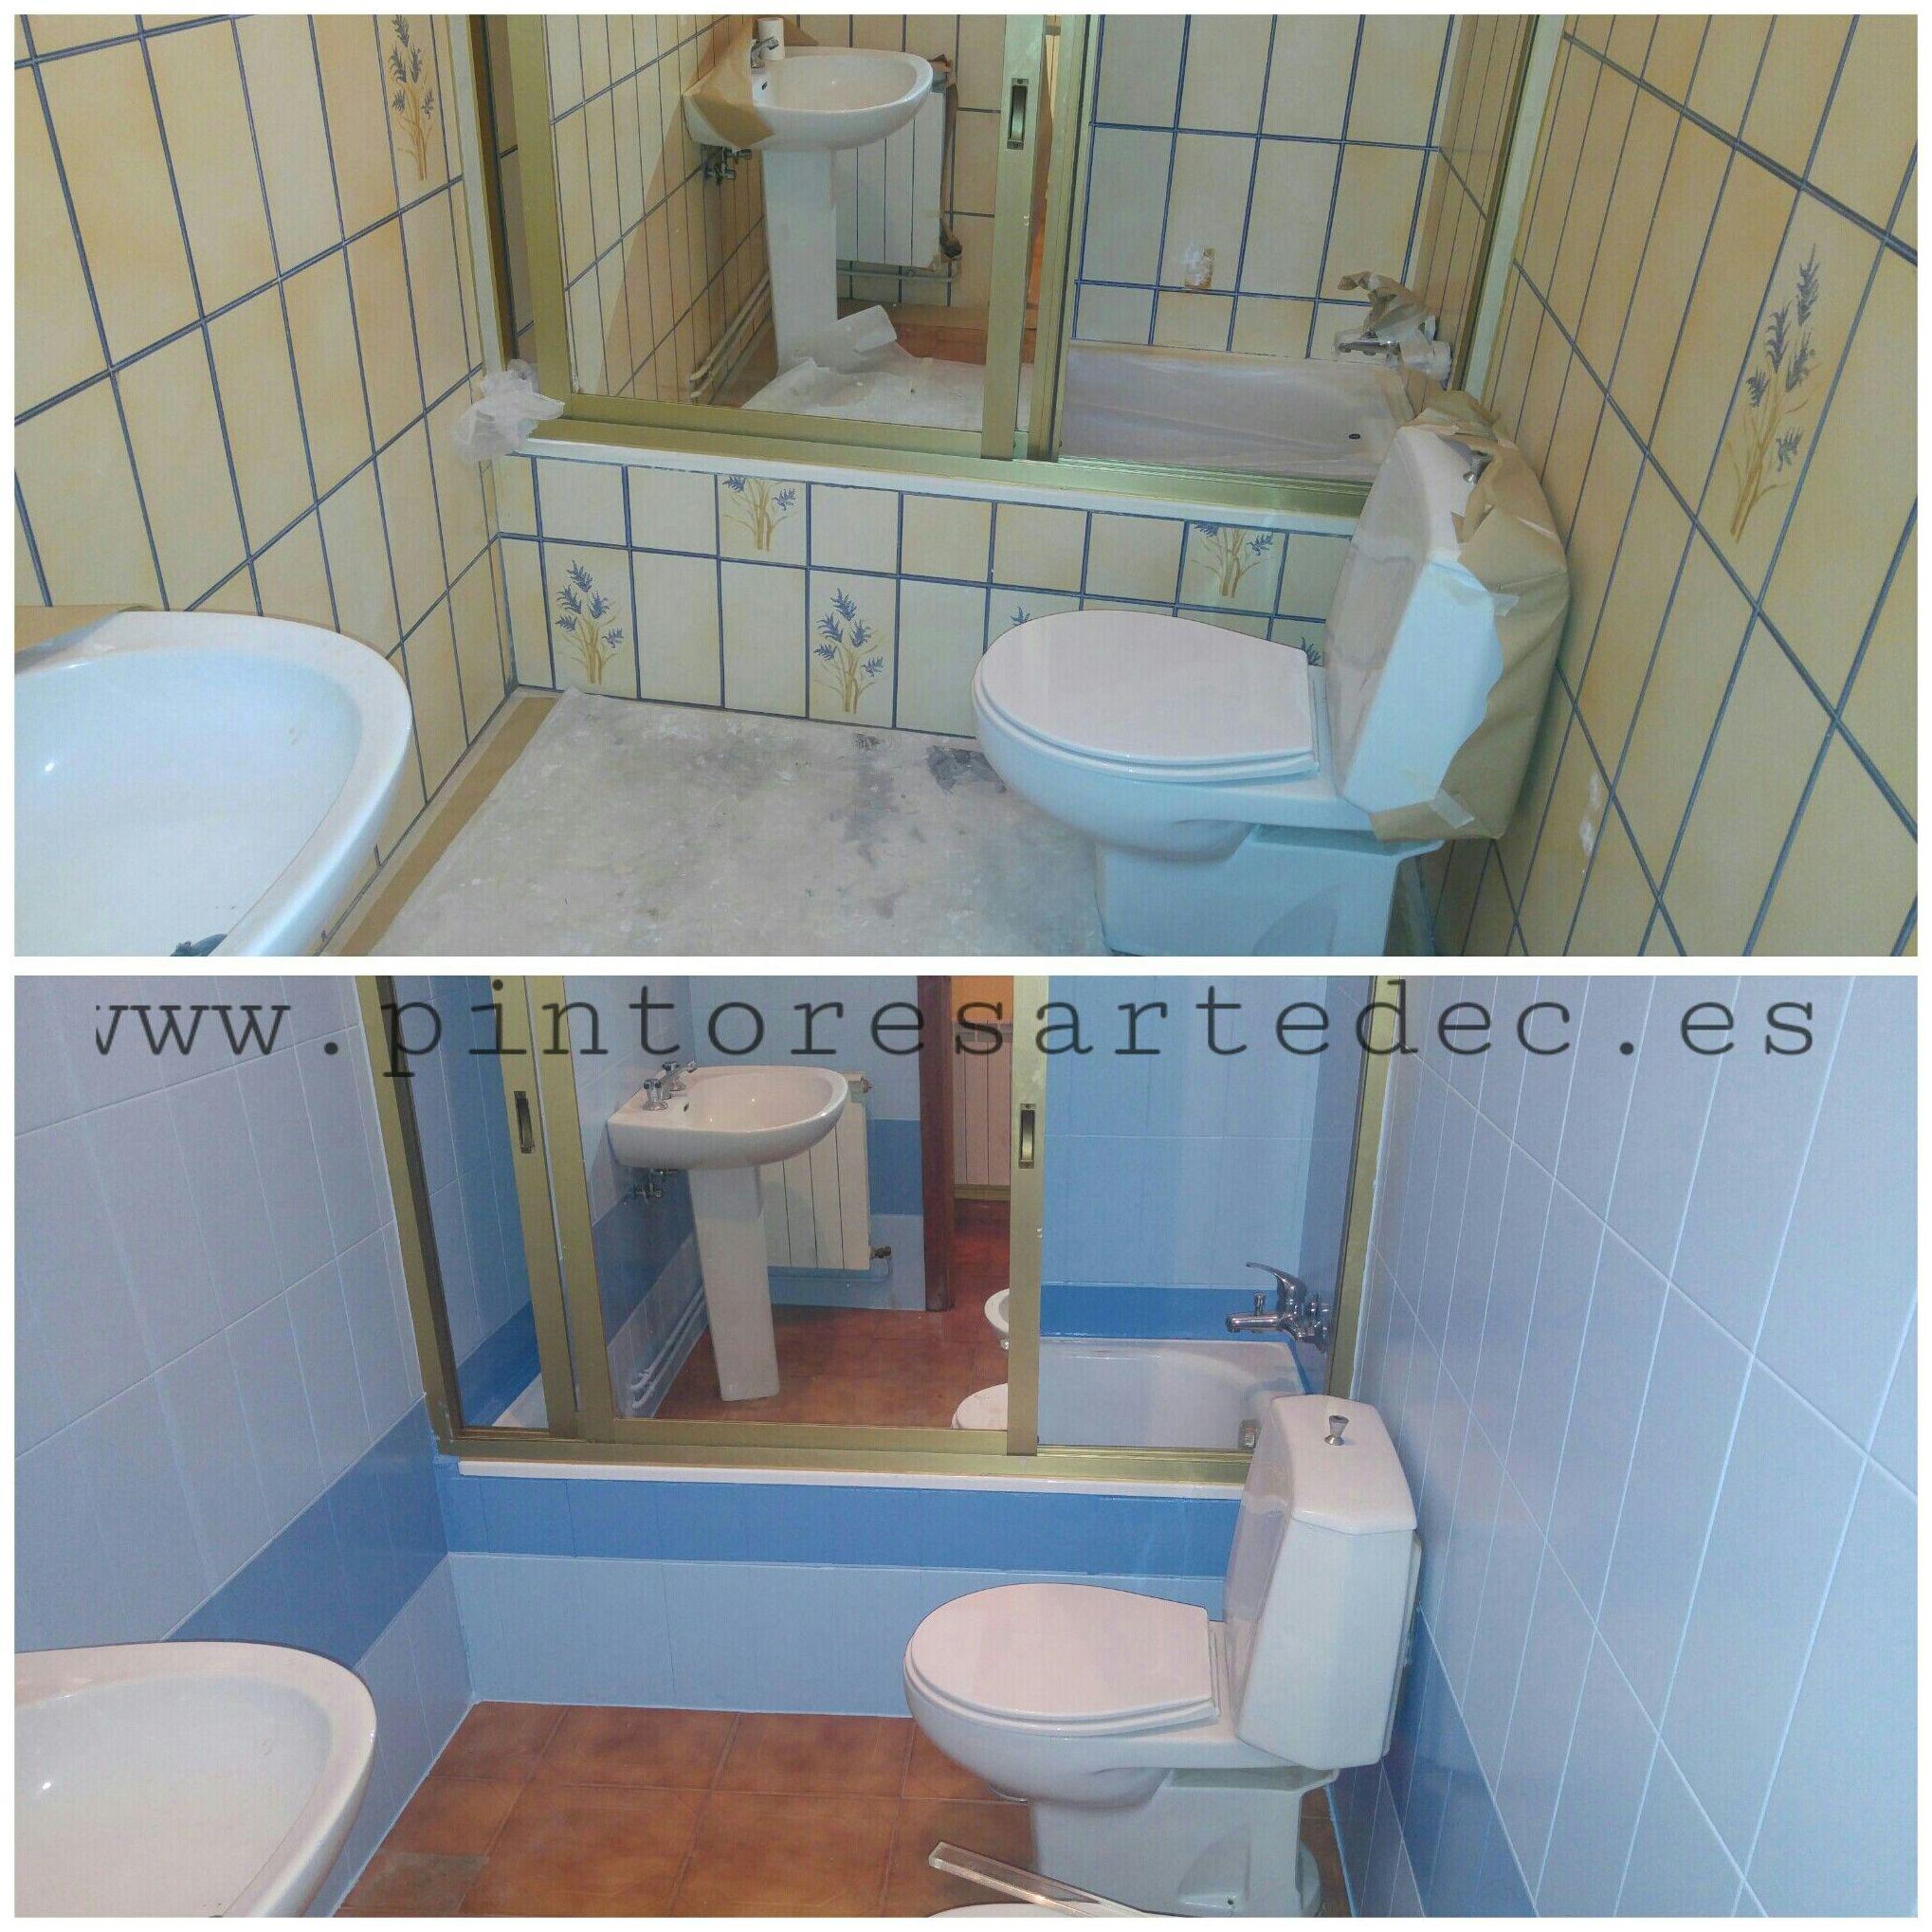 Pintura para azulejos servicios de pintores artedec - Pintura azulejos cocina ...